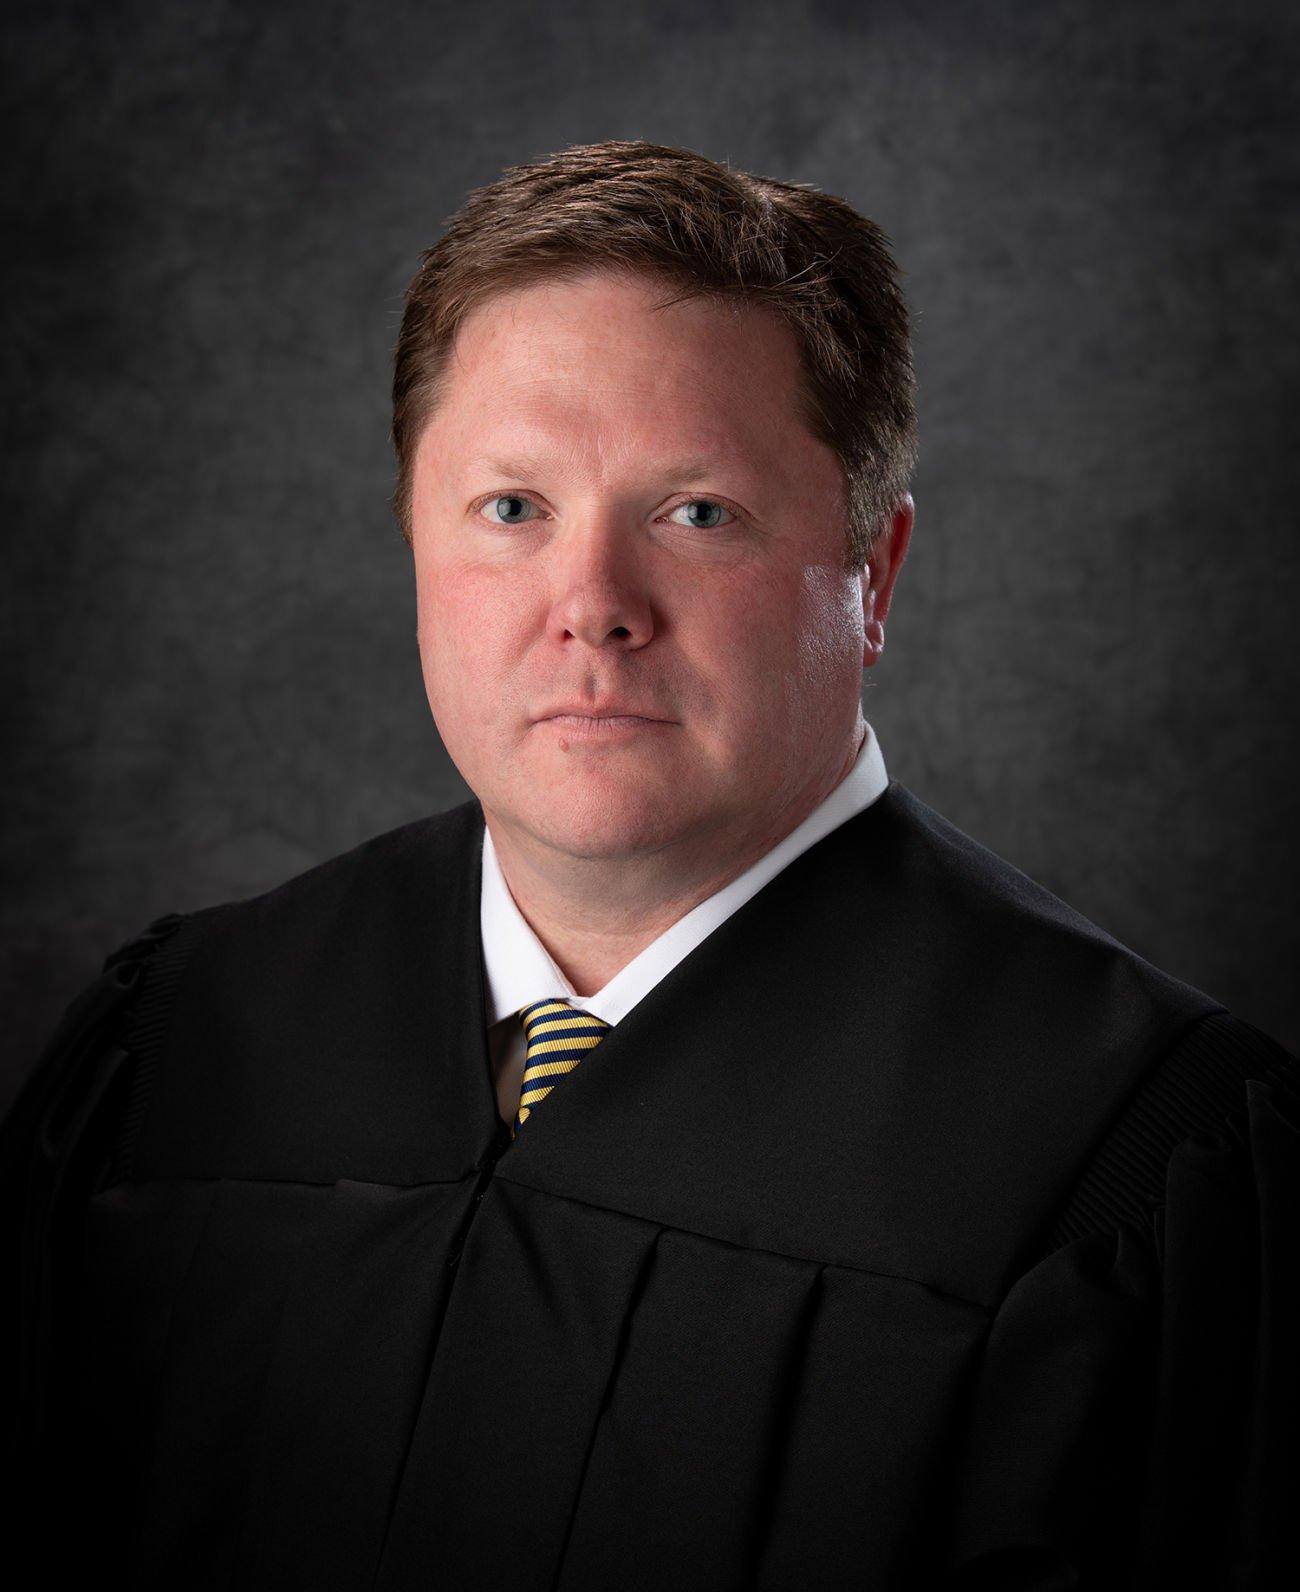 U.S. District Judge Thomas S. Kleeh